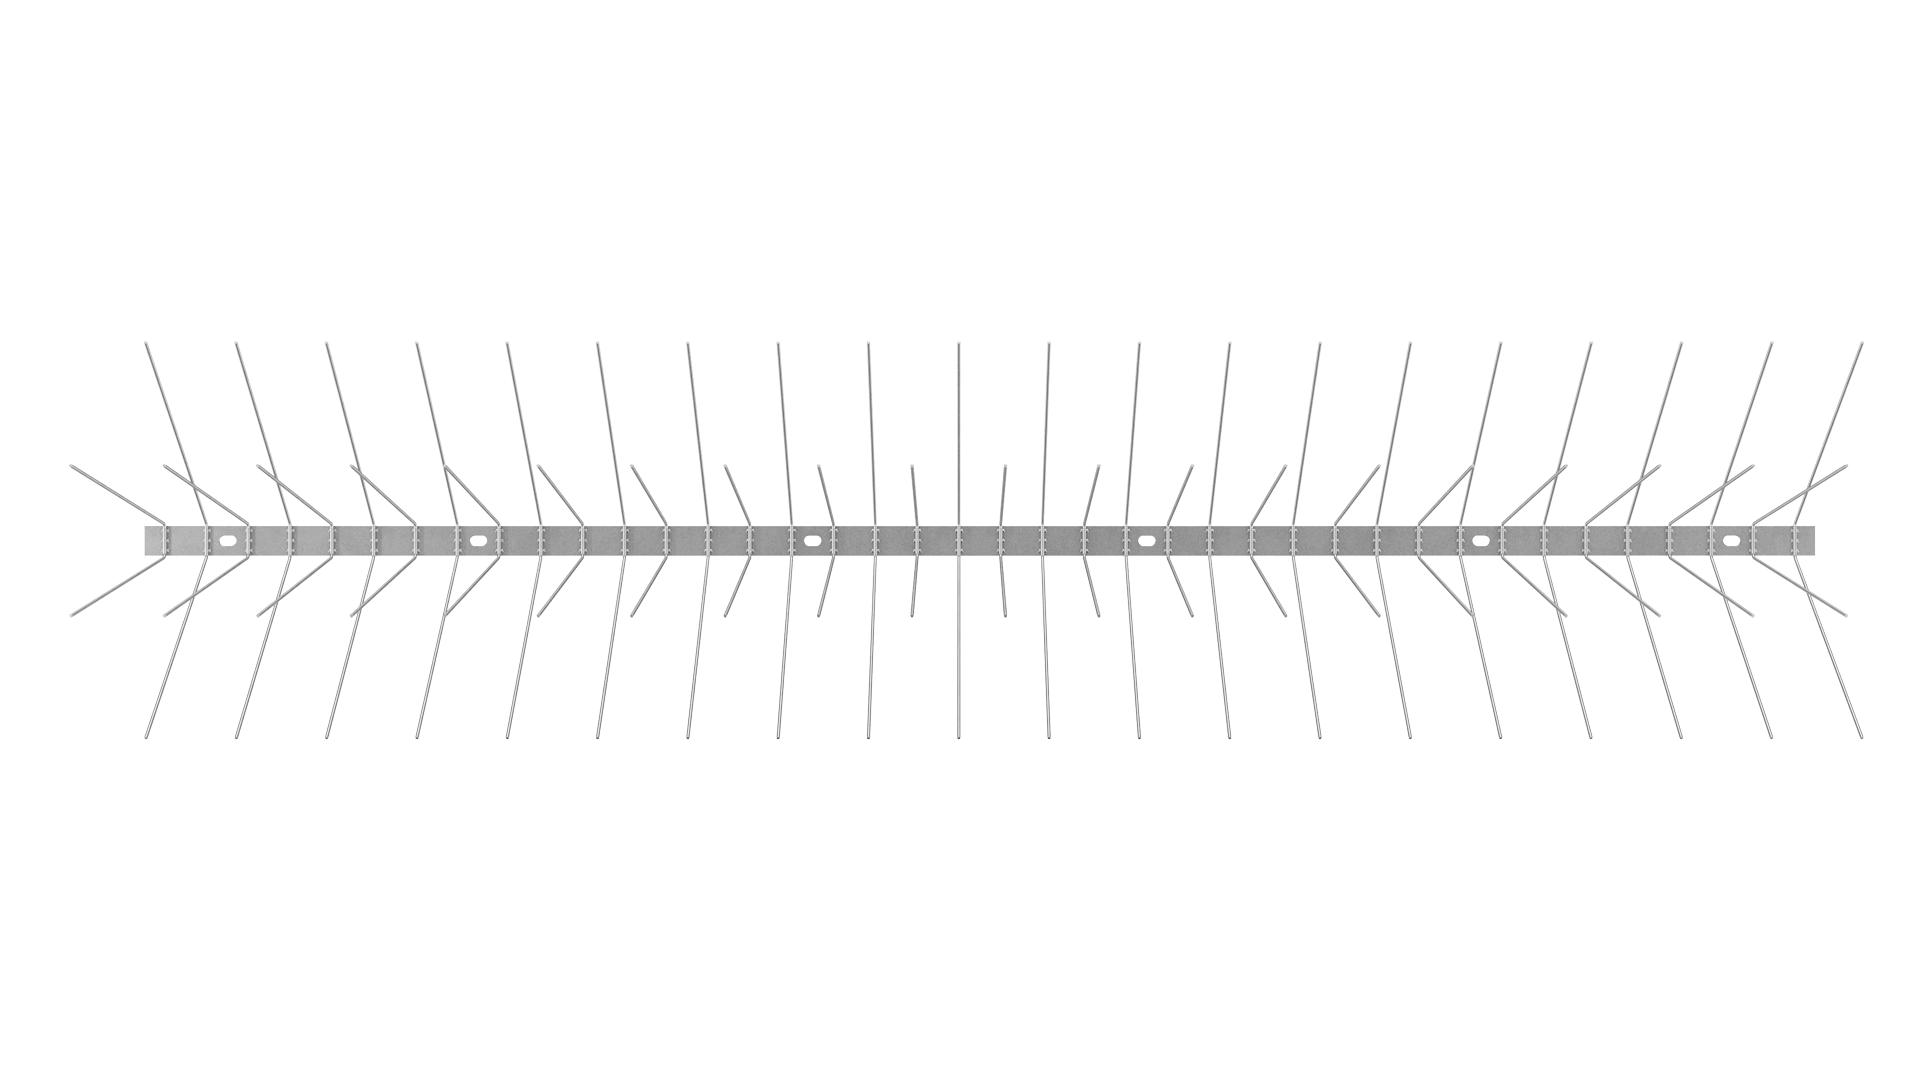 TAS 4er Taubenabwehrspitzen ( Möwen / Krähen / Tauben ) 1 m lang, Spitzen 2.0 mm stark, 147 mm lang aus Edelstahl Rostfrei